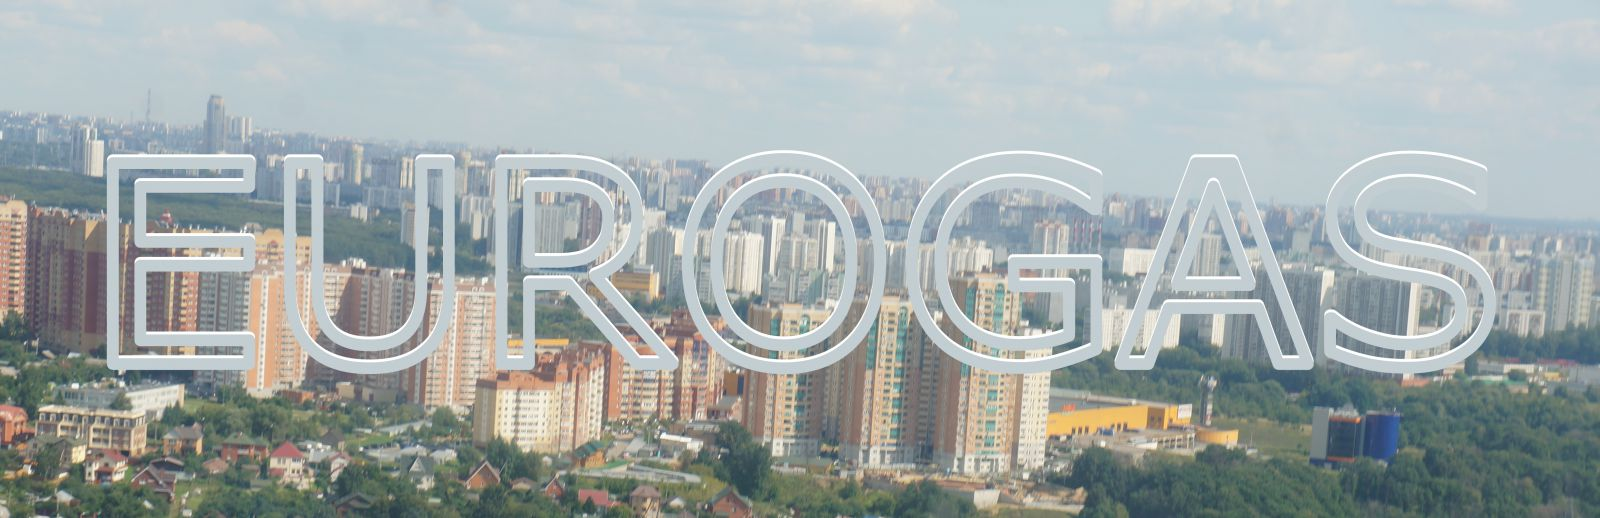 site:europagaz.ru, agnks, agzs, cng station, gas, +7 495 7294718, EUROGAS MOSCOW RUSSIA